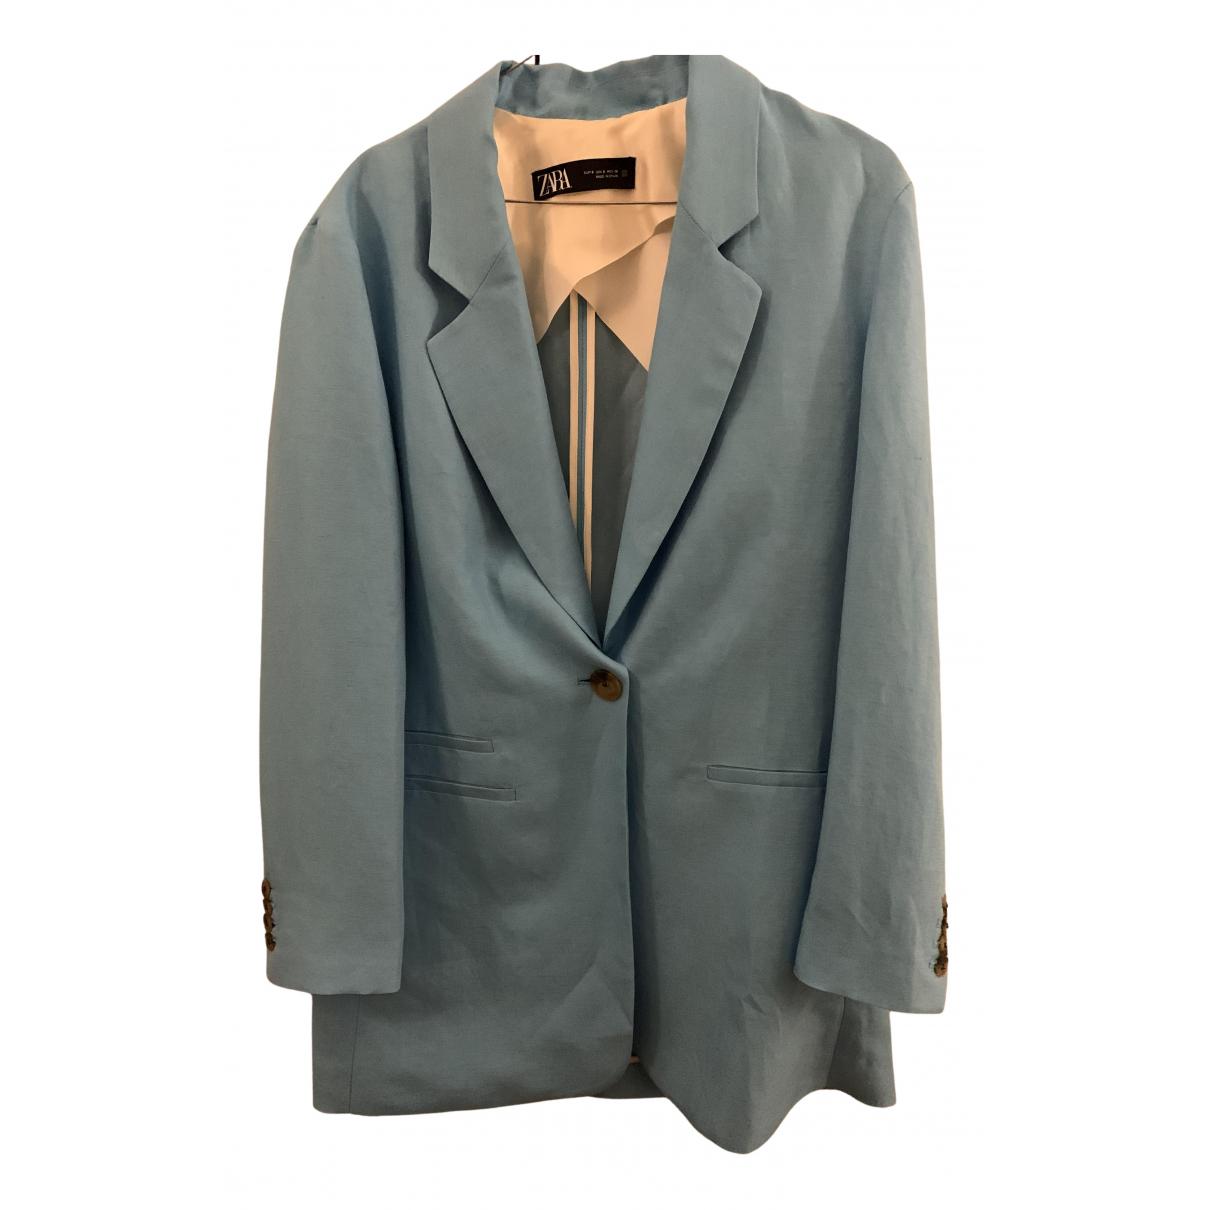 Zara - Veste   pour femme en lin - marine